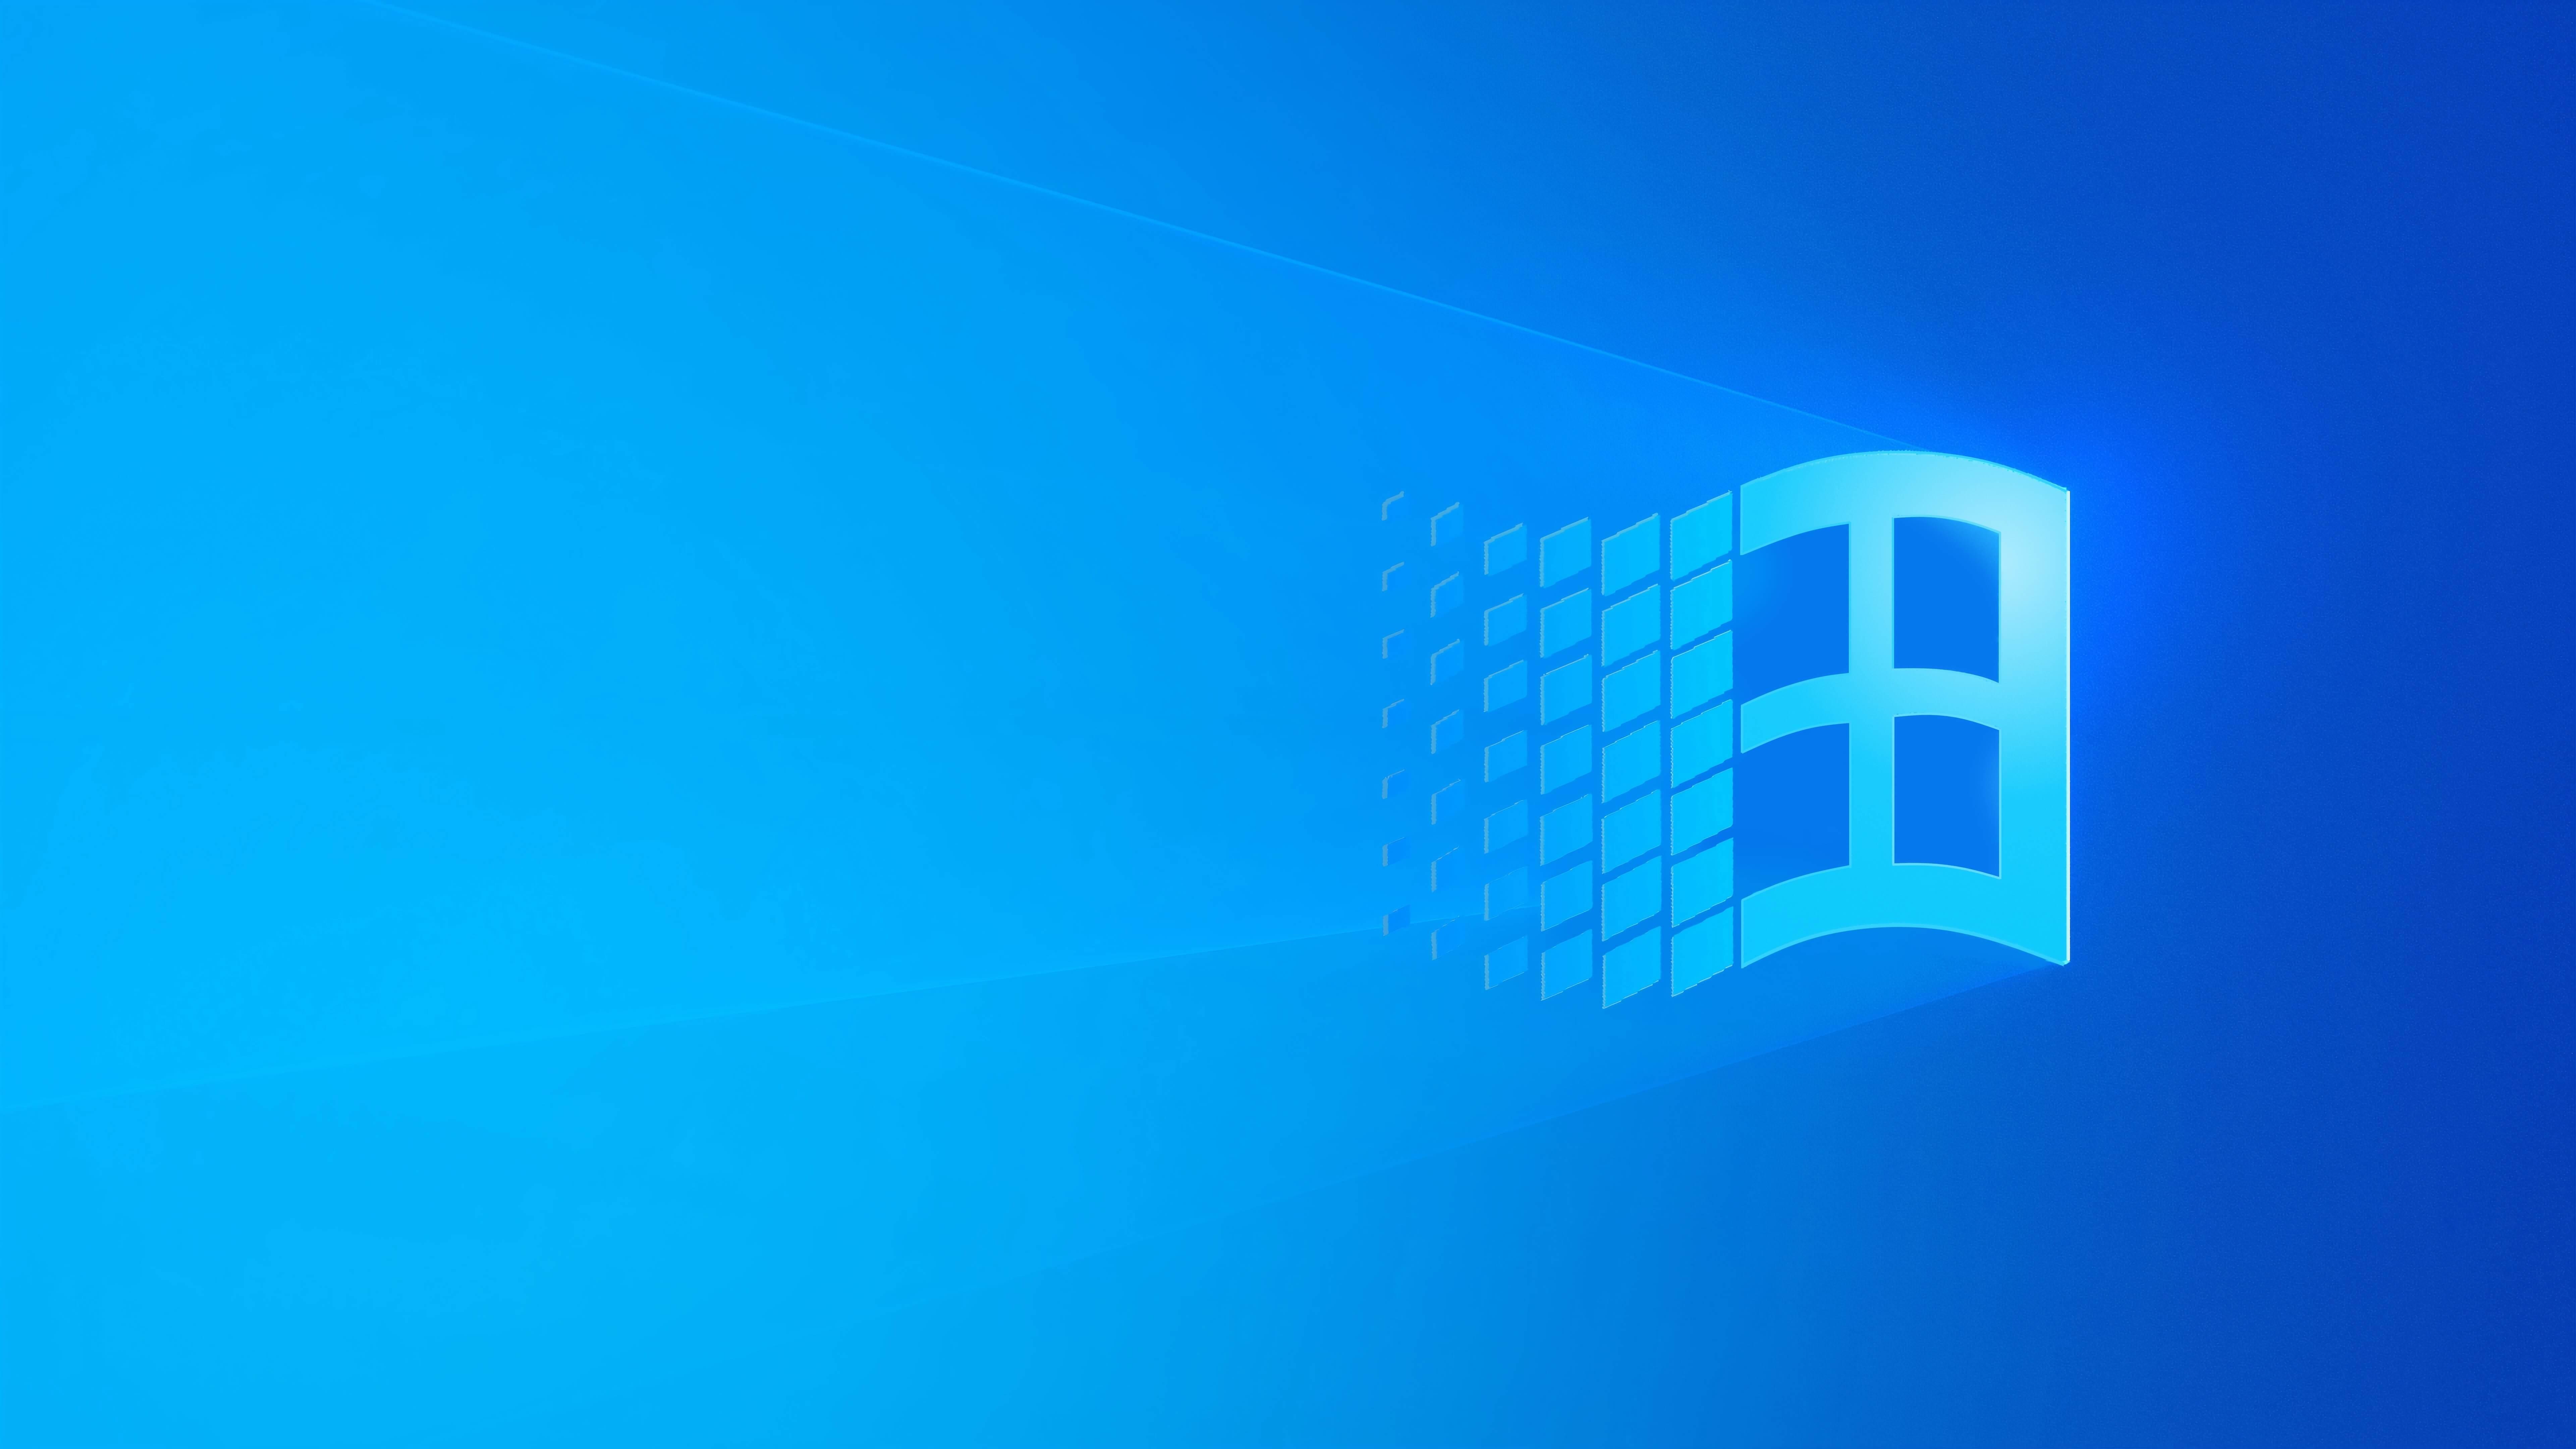 Retro Windows desktop wallpaper free download